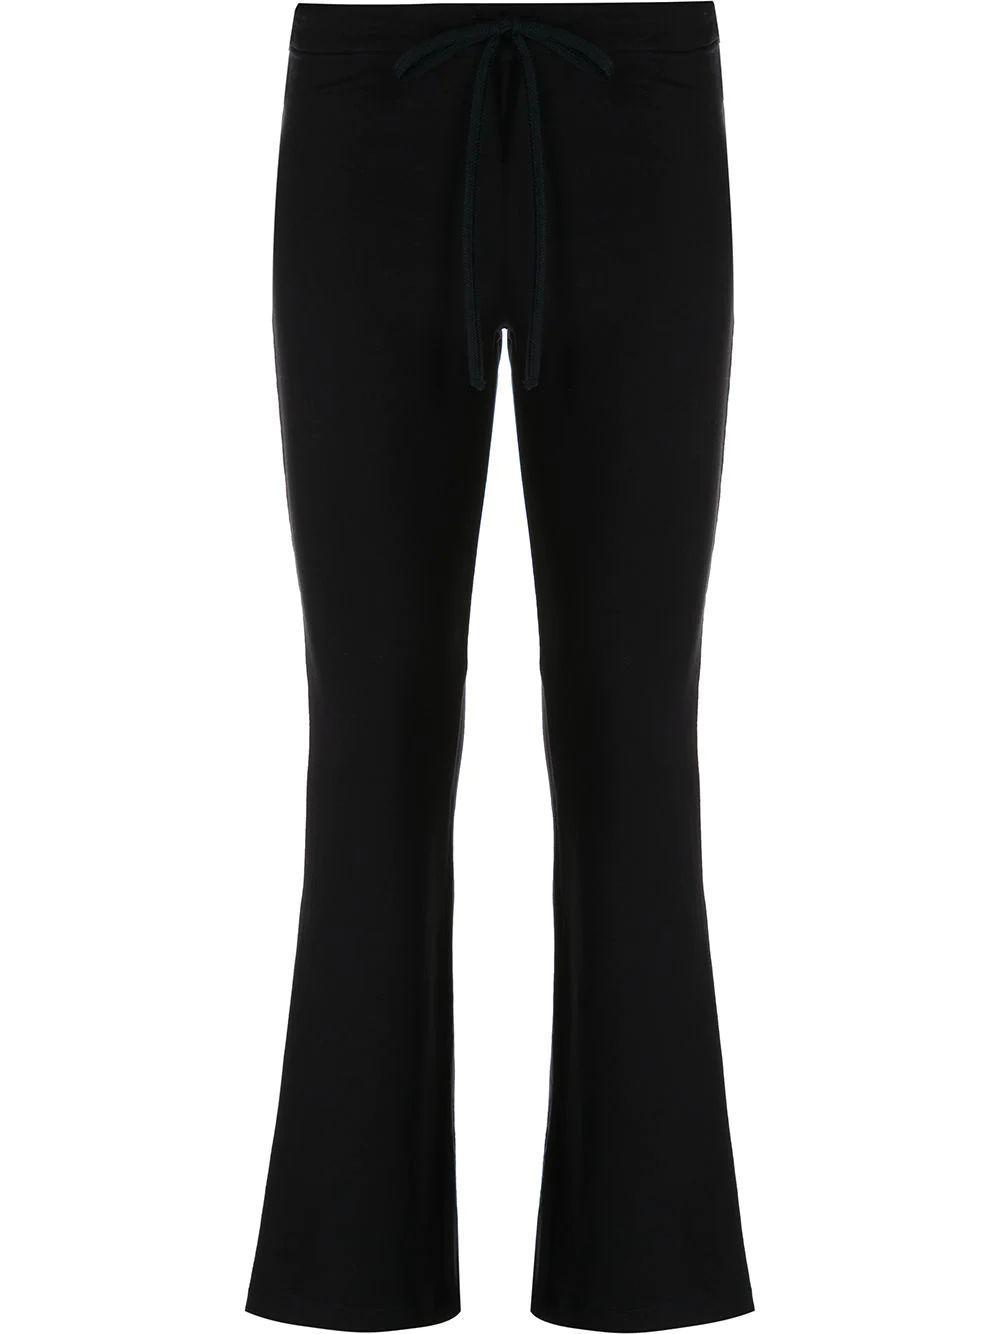 French Terry Drawstring Pants Item # M003FPA070